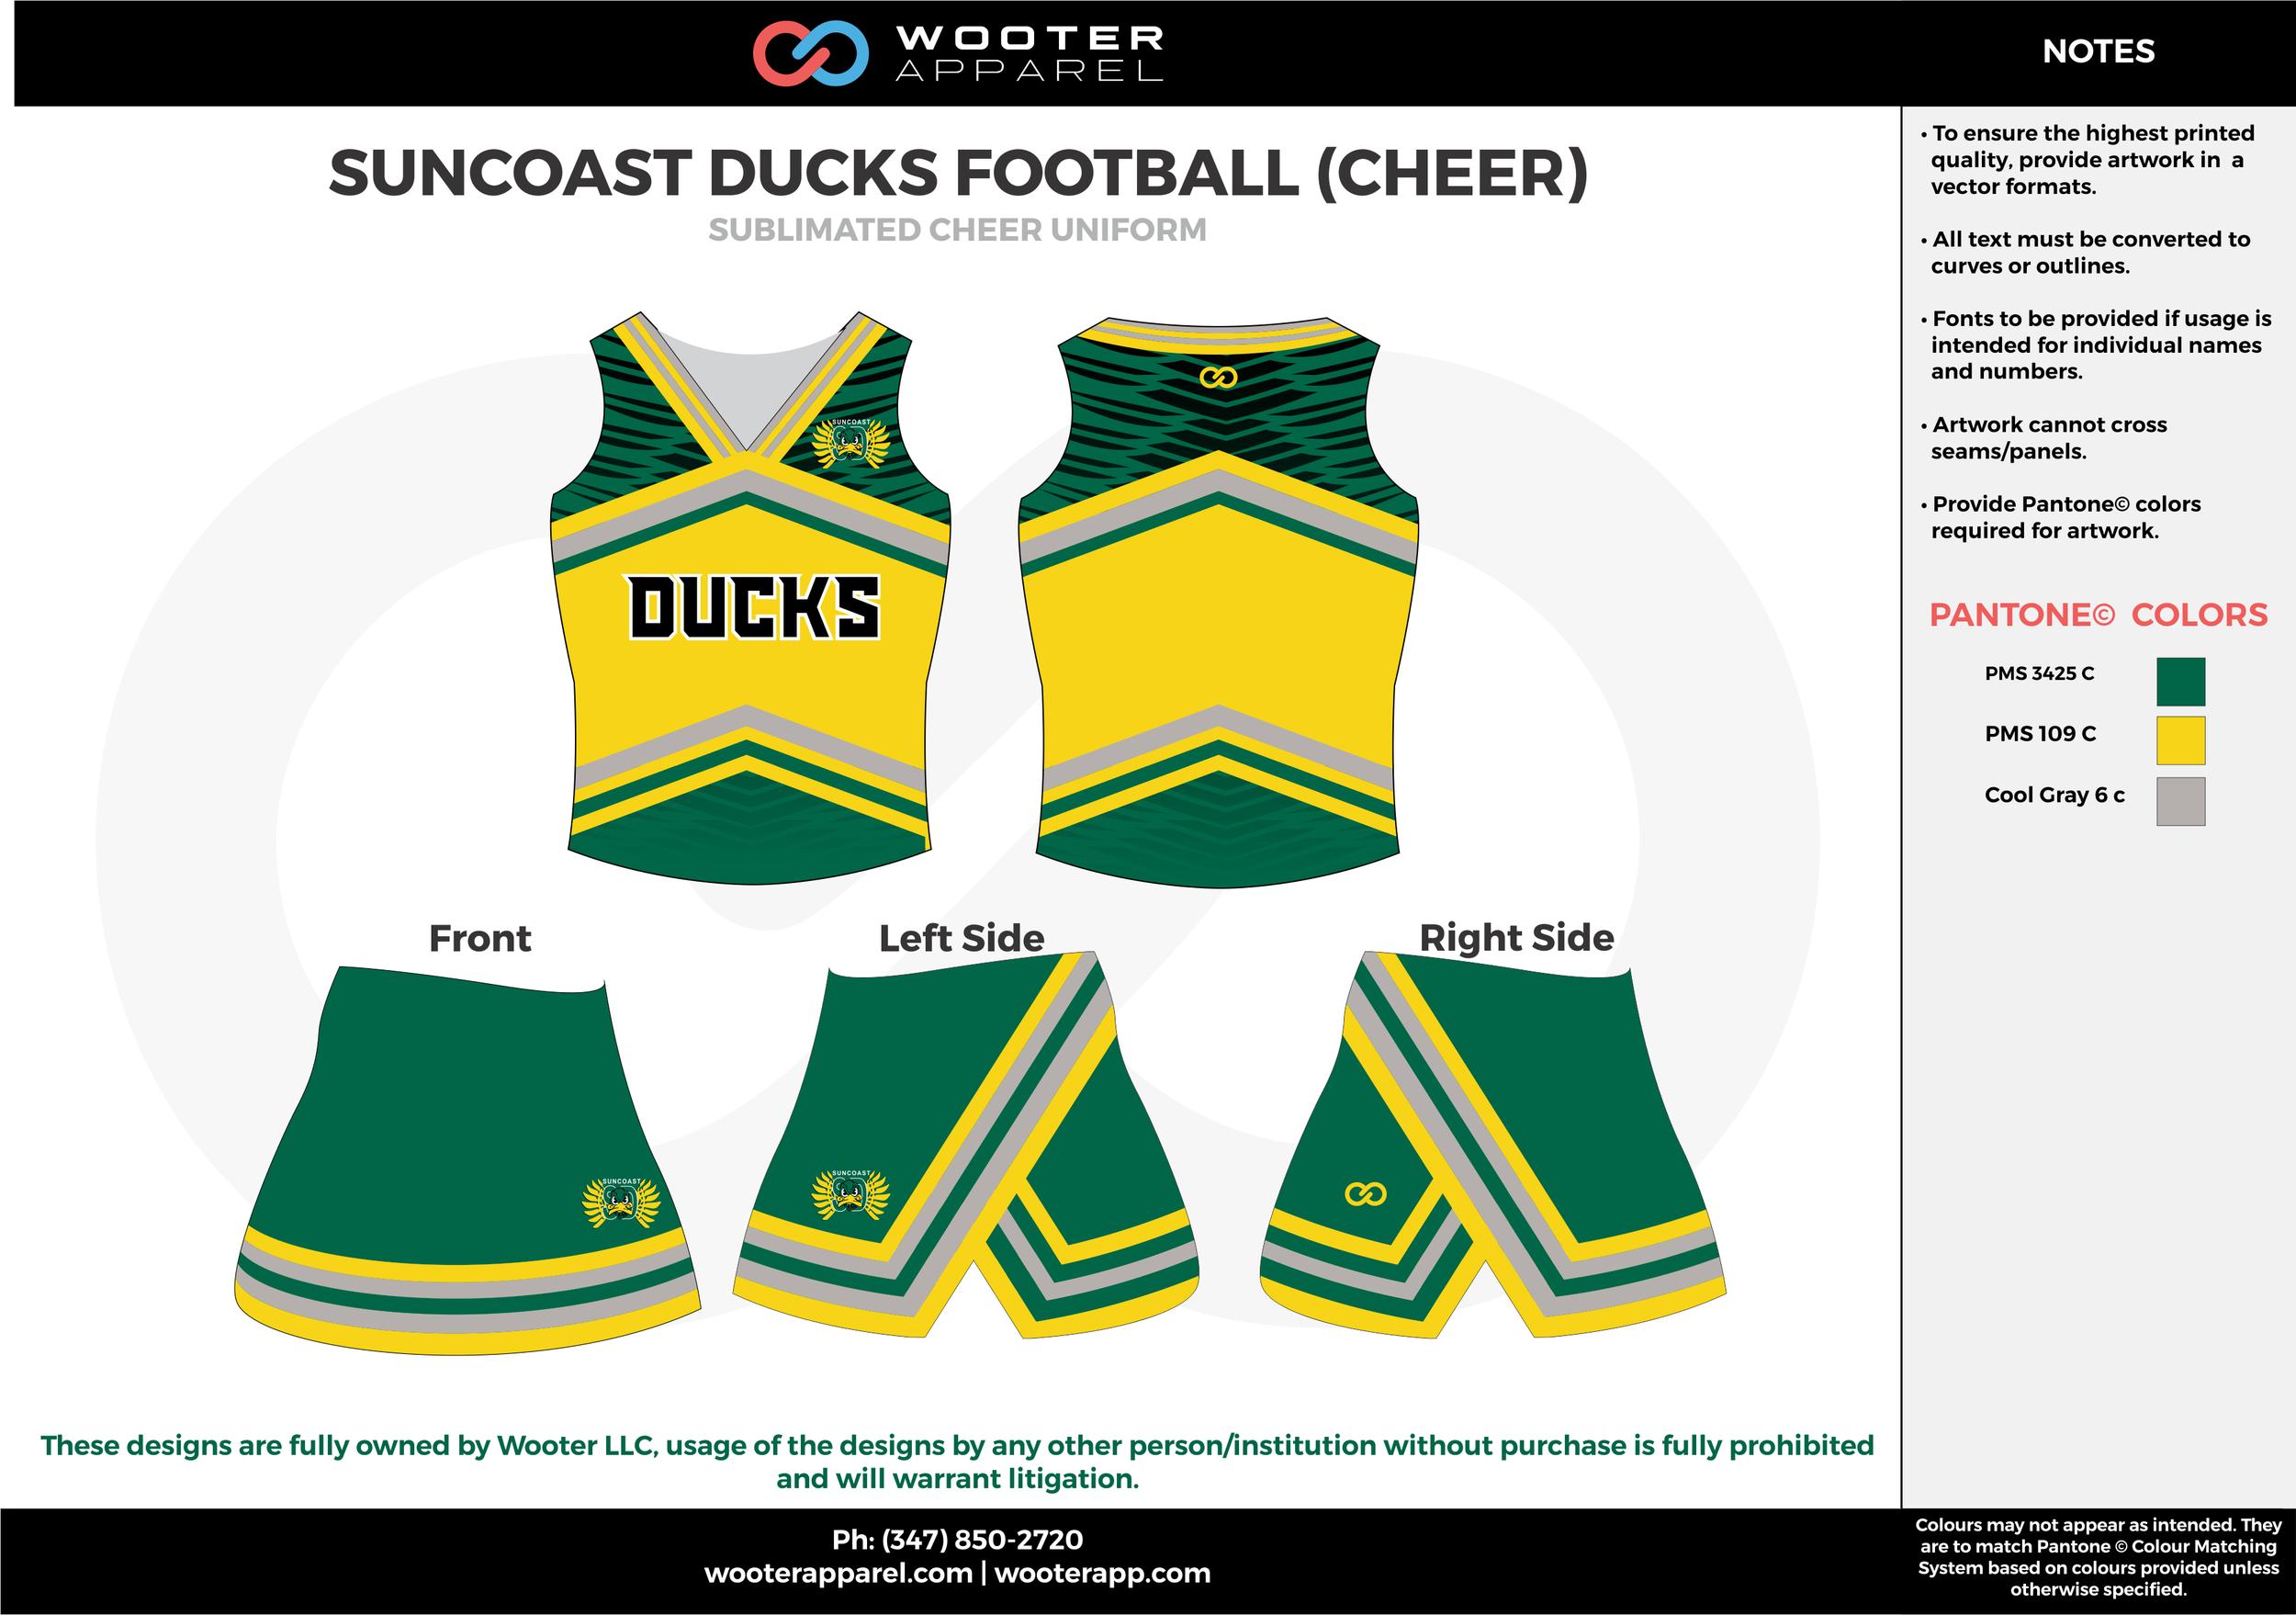 SUNCOAST DUCKS FOOTBAL green yellow blue cheerleading uniforms, top, and skirt